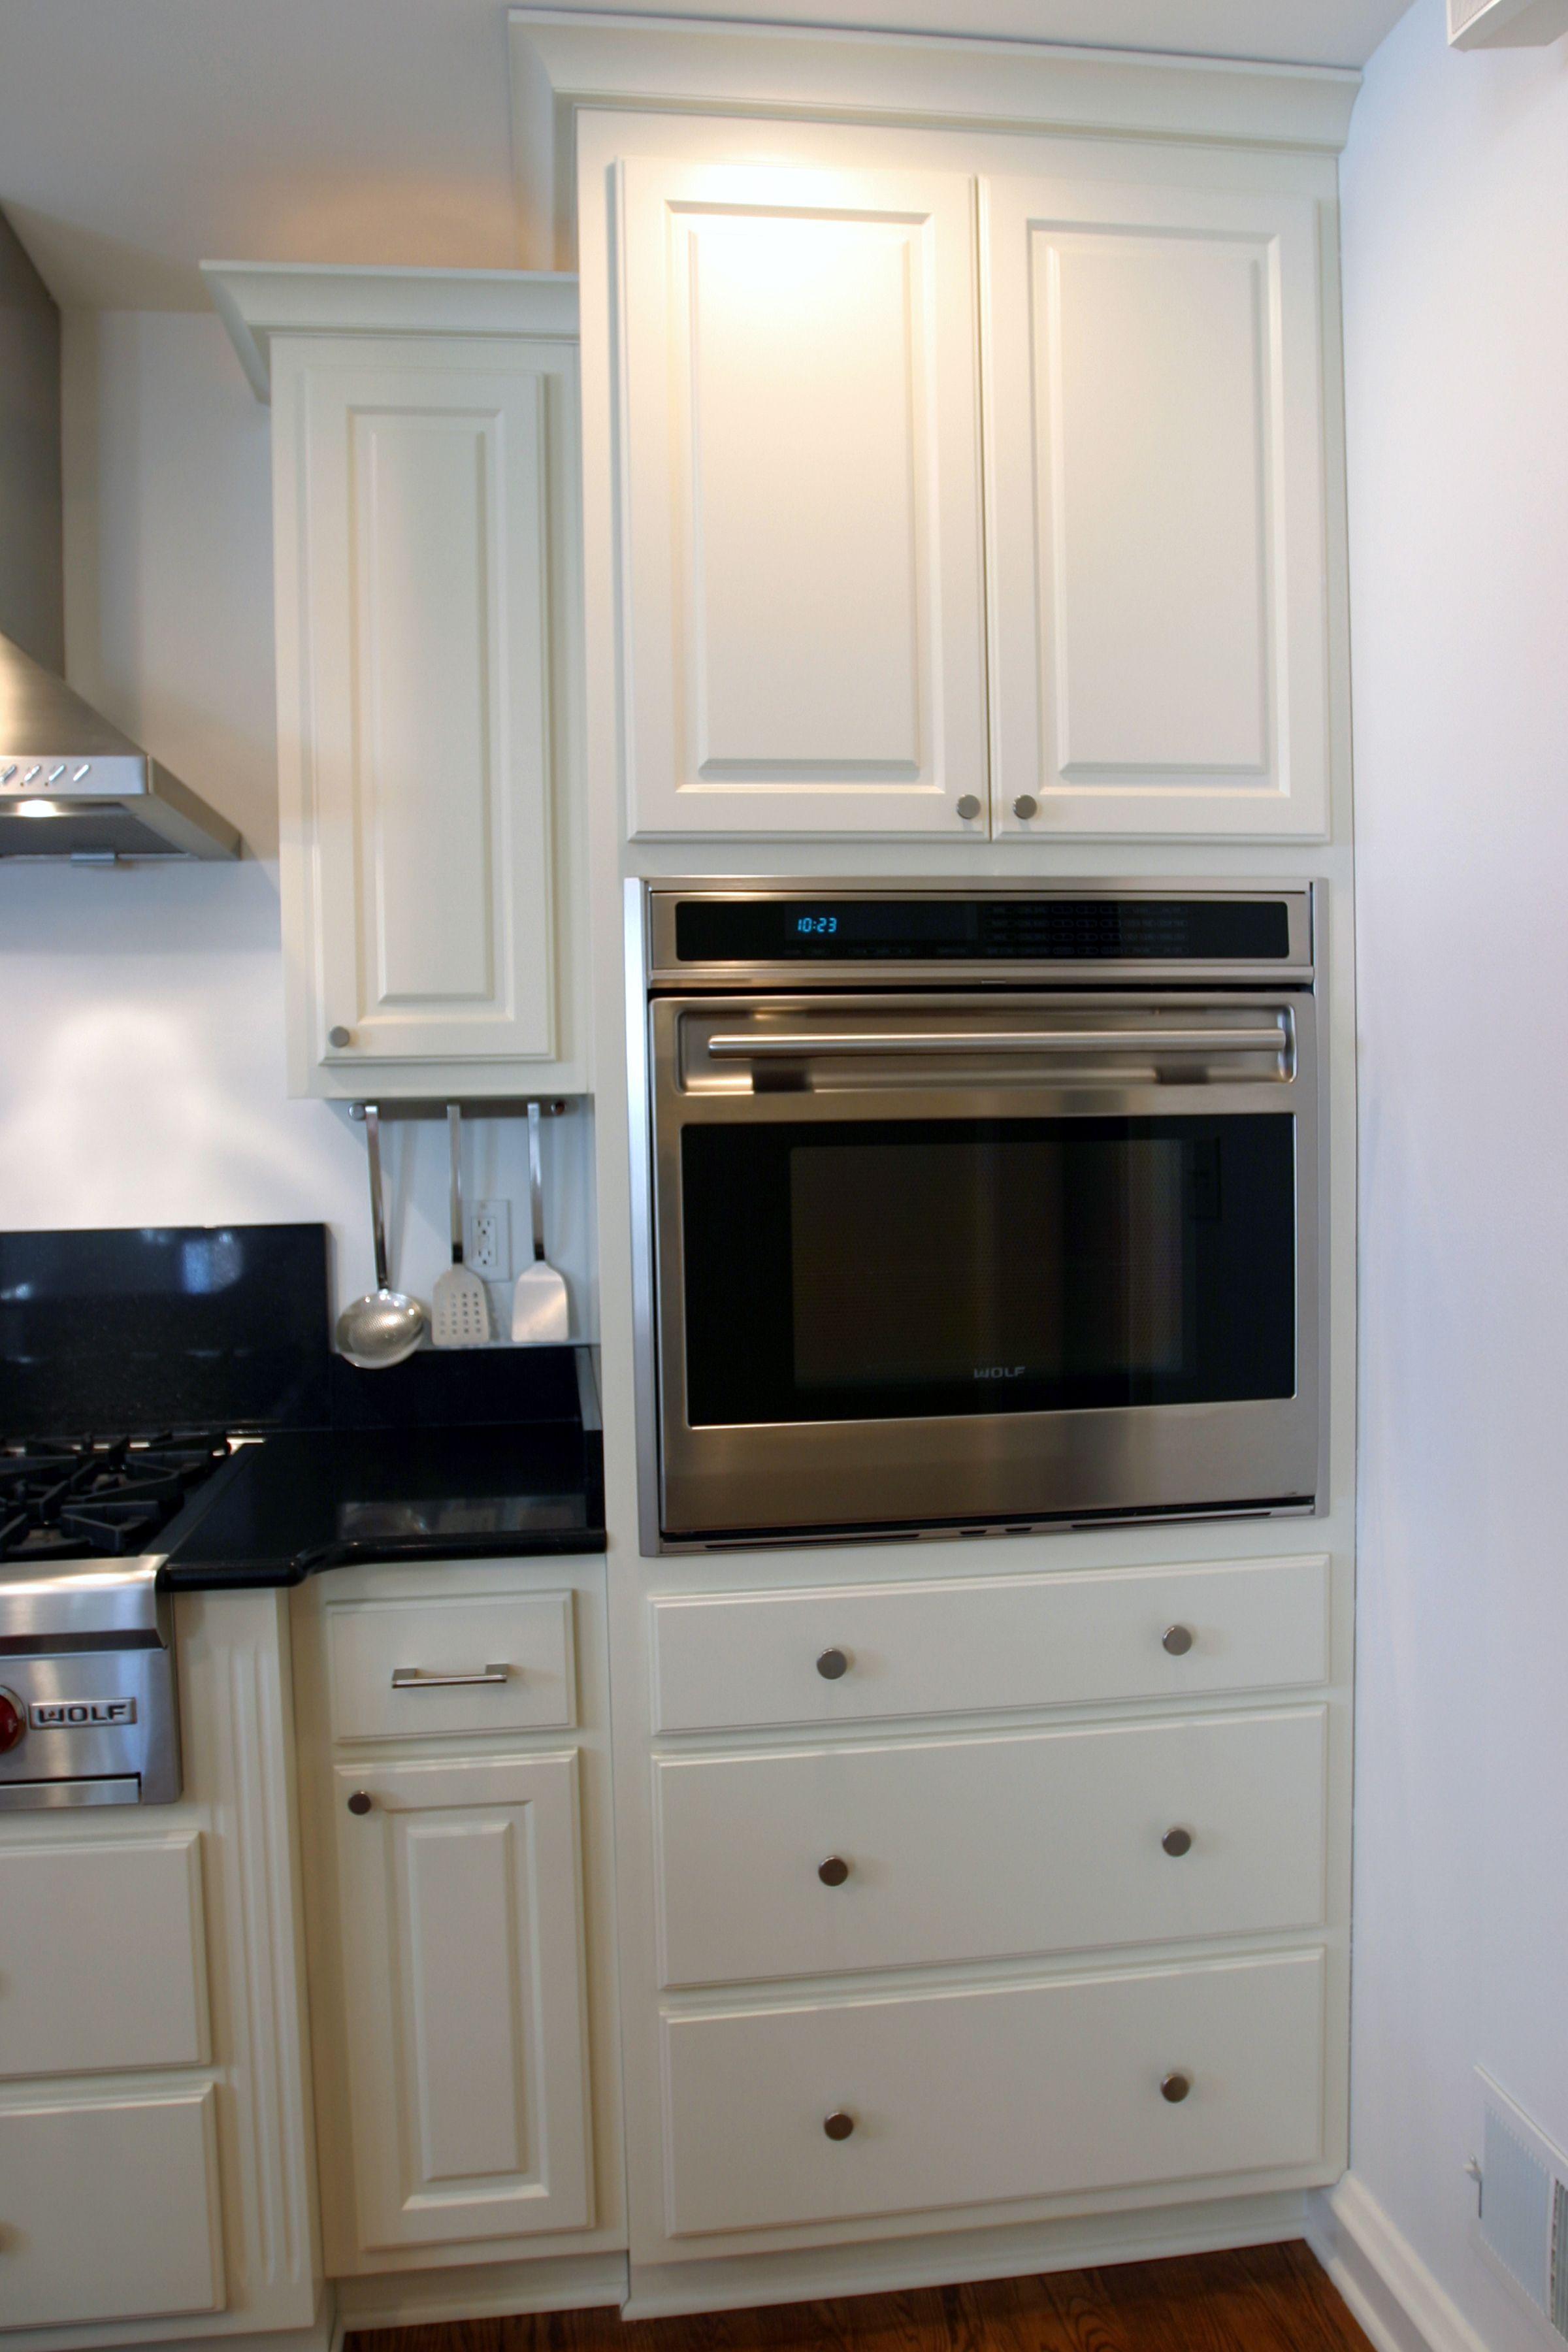 15 Fabulous Kitchen Remodel Dark Cabinets Ideas